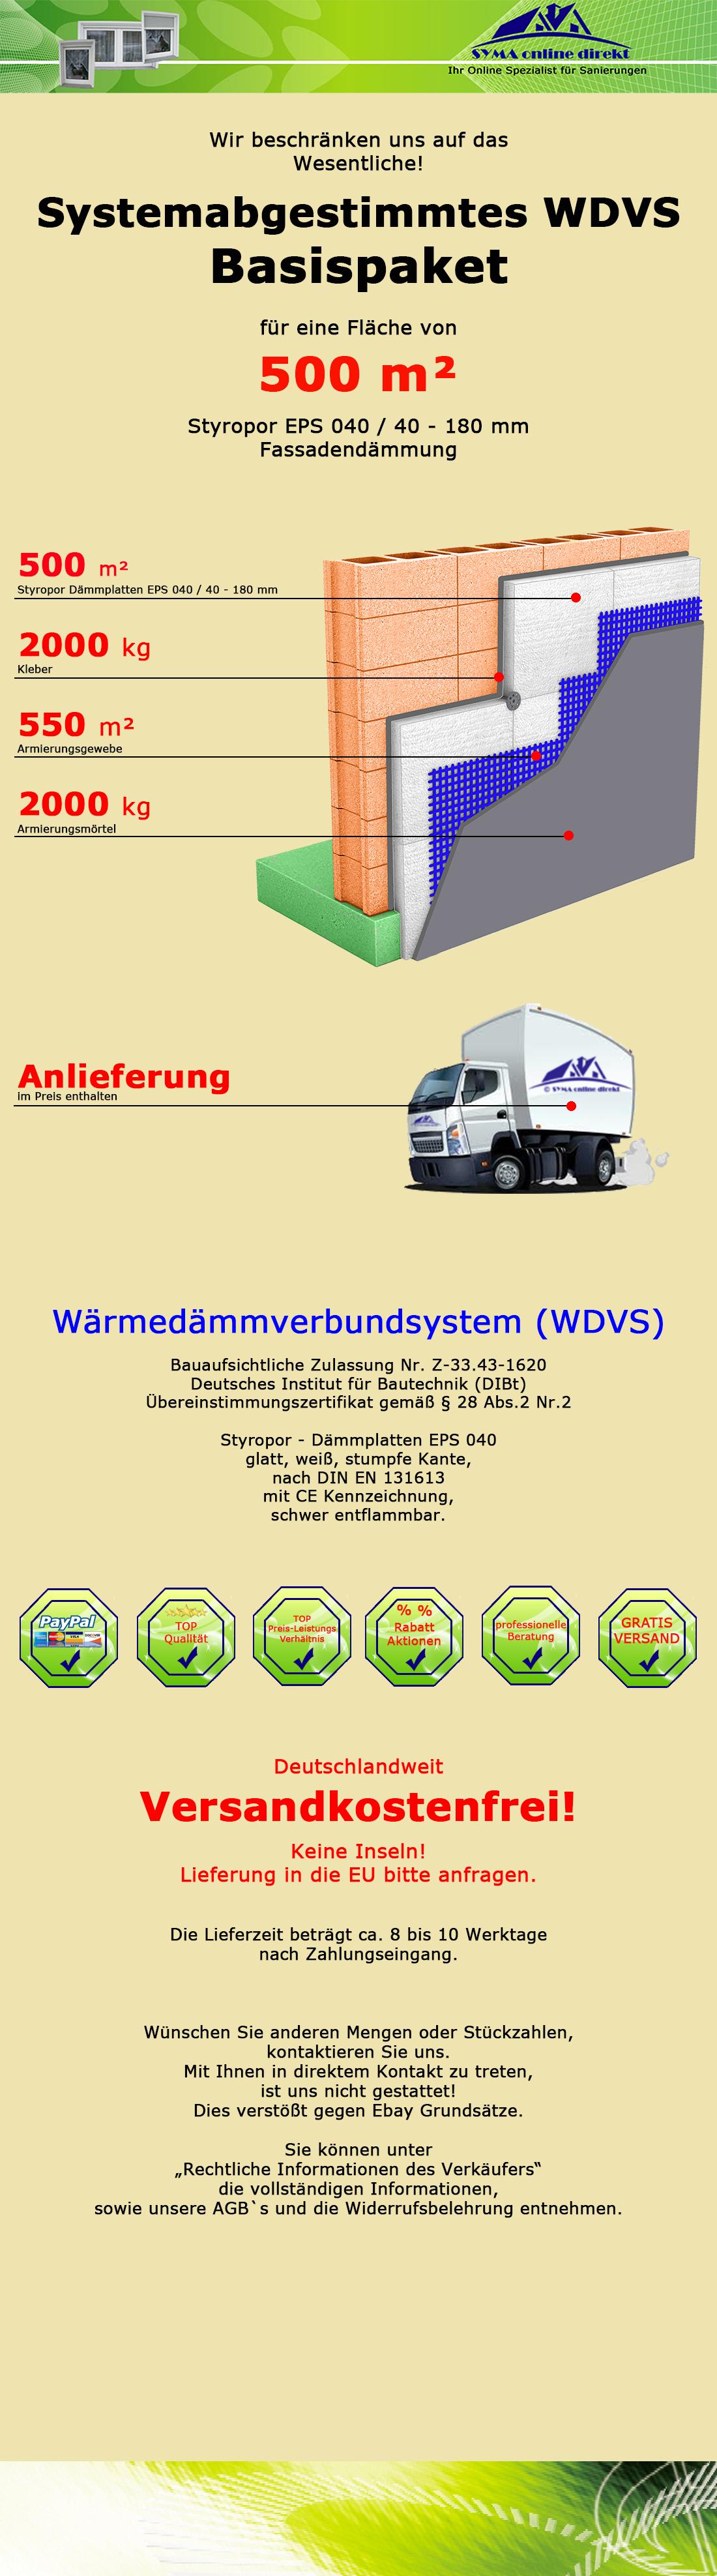 Edelstahl L316 Ring Partnerring Freundschaftsring Ehering Gravur inclusive 10155